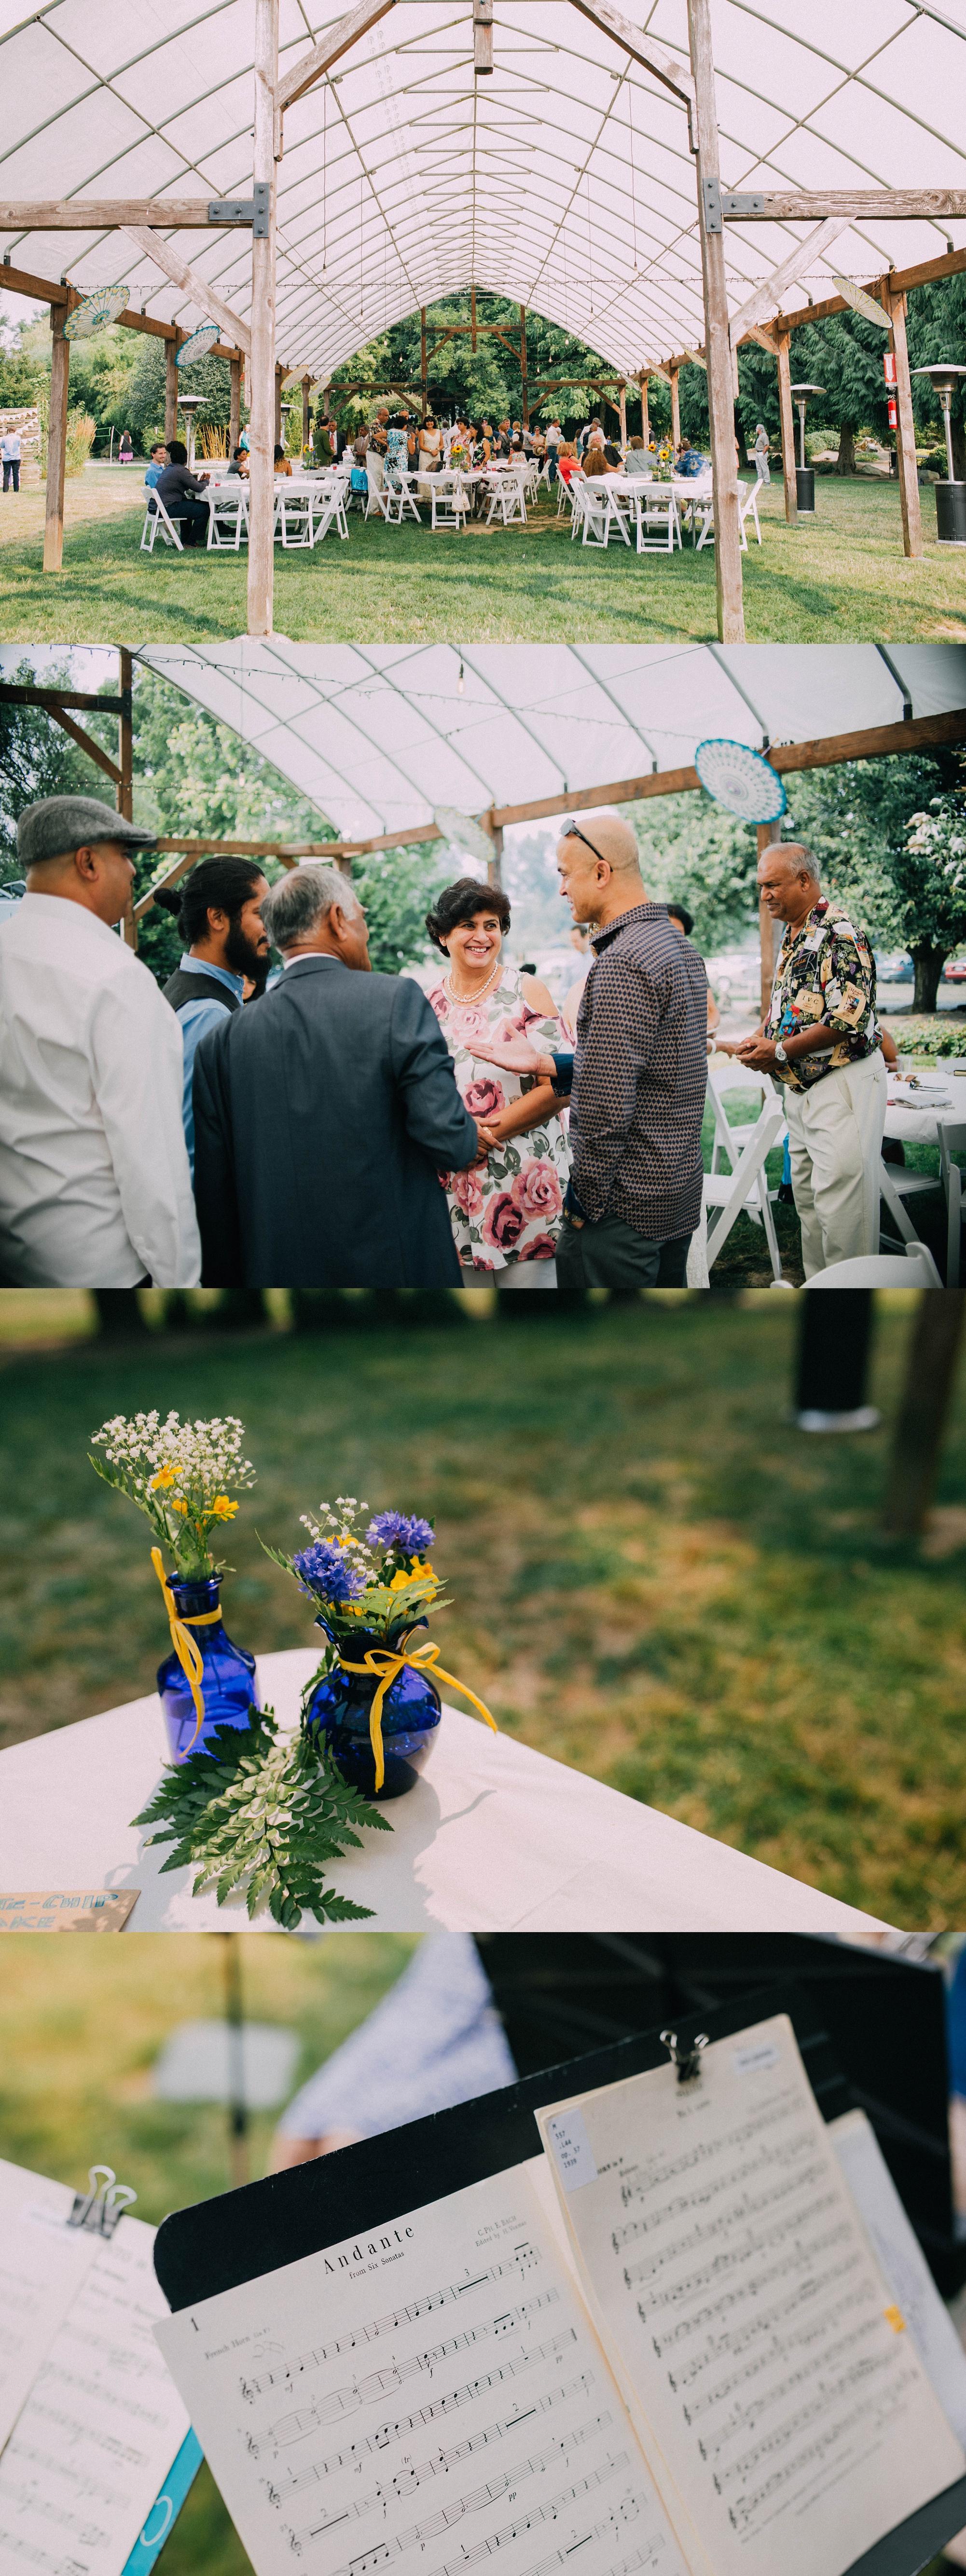 ashley_vos_seattle_ wedding_photographer_0462.jpg